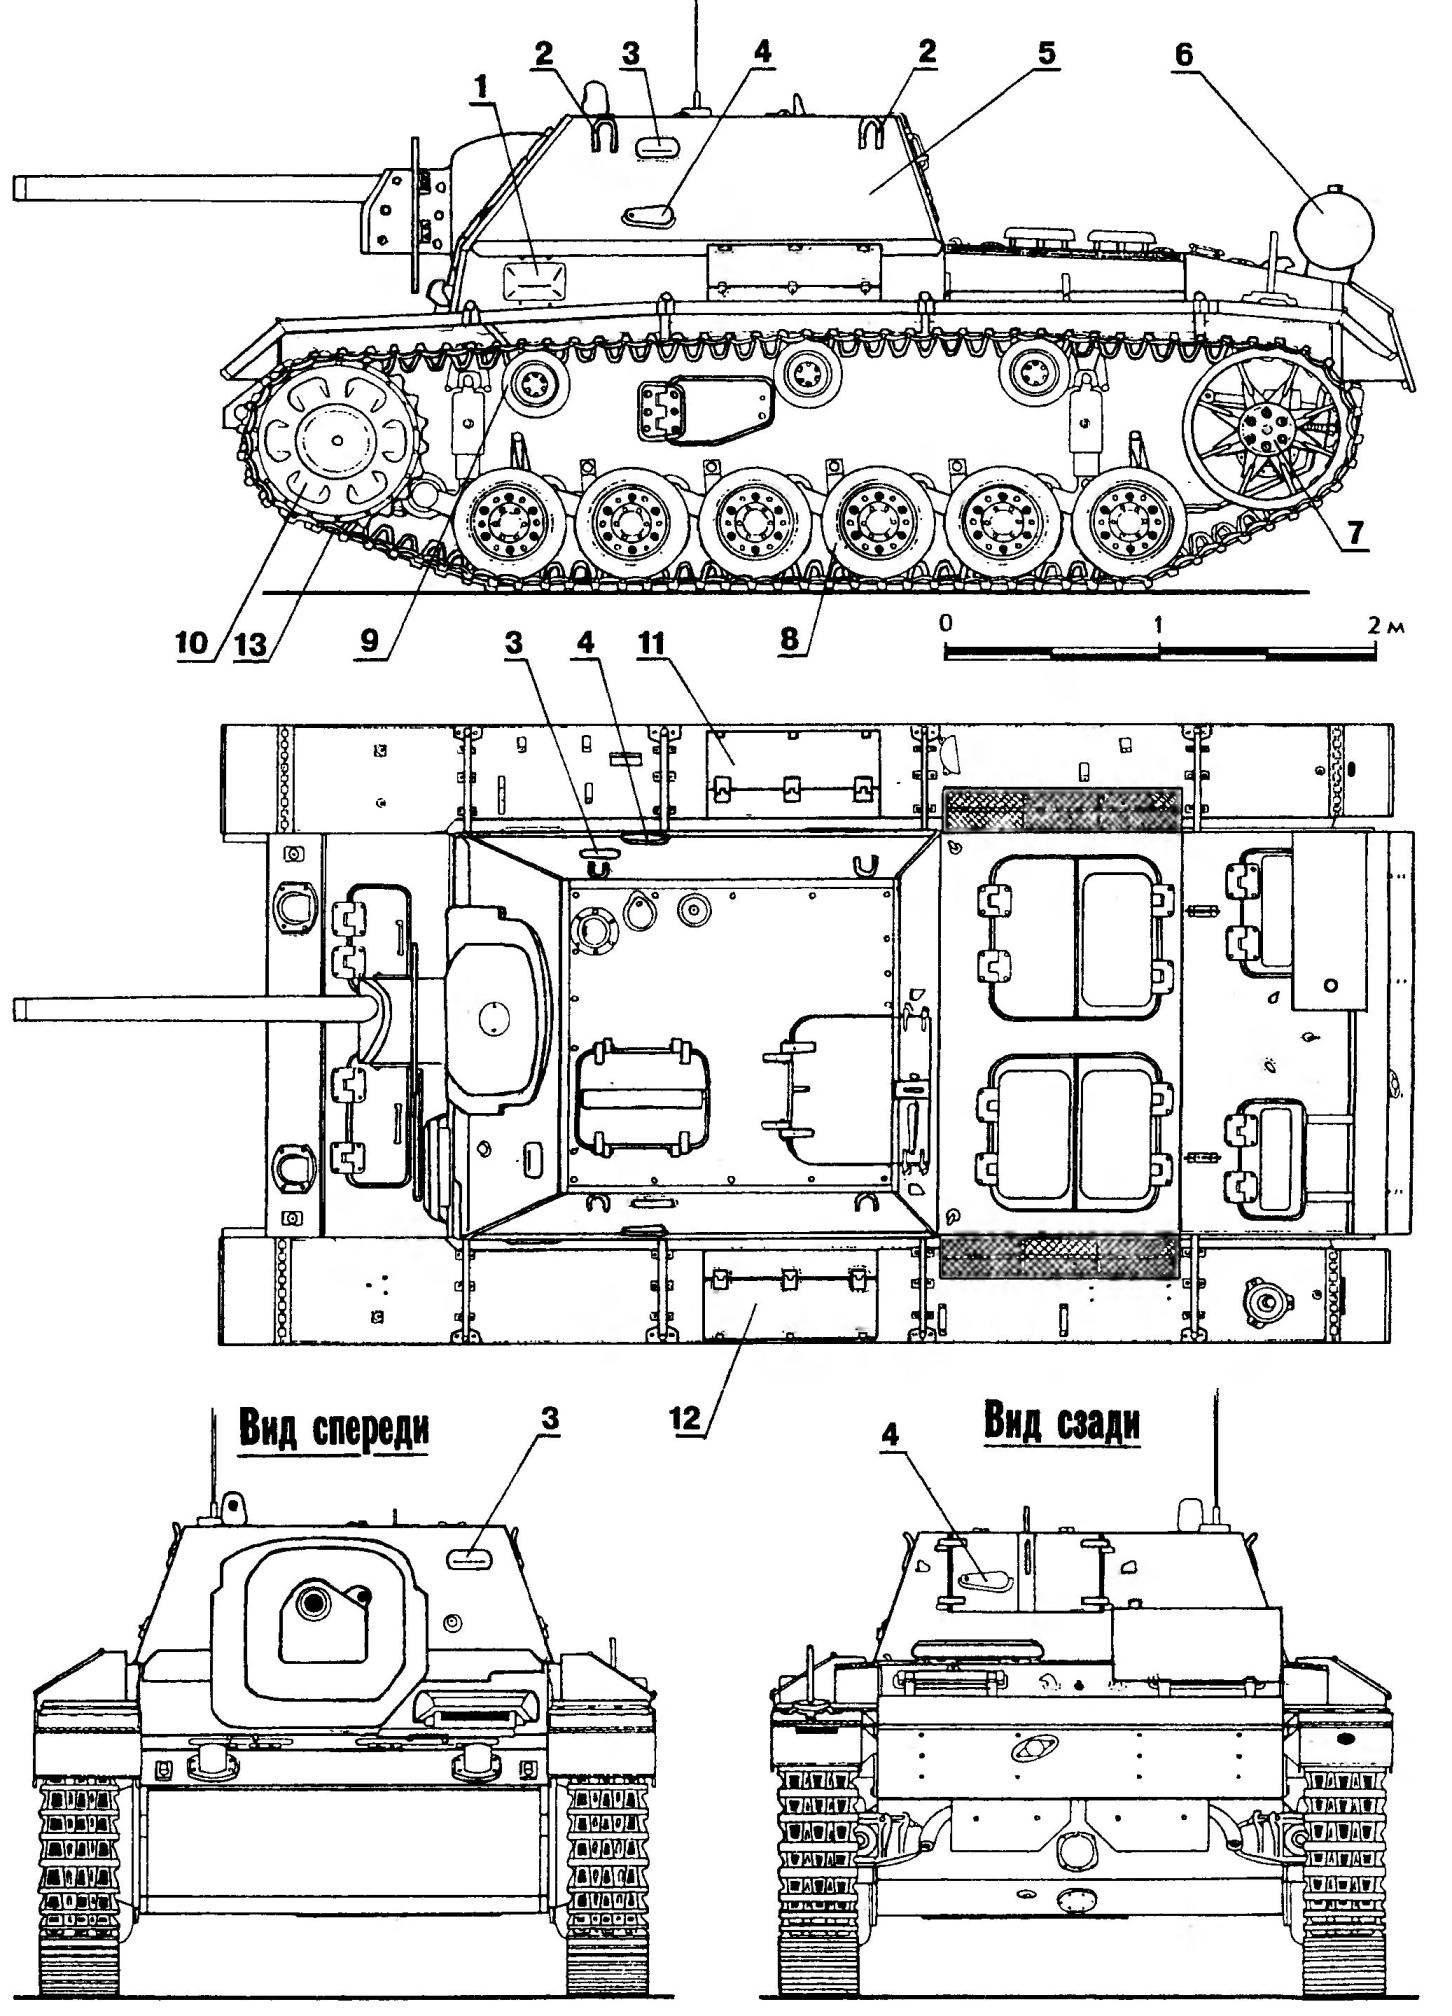 СУ - 76И